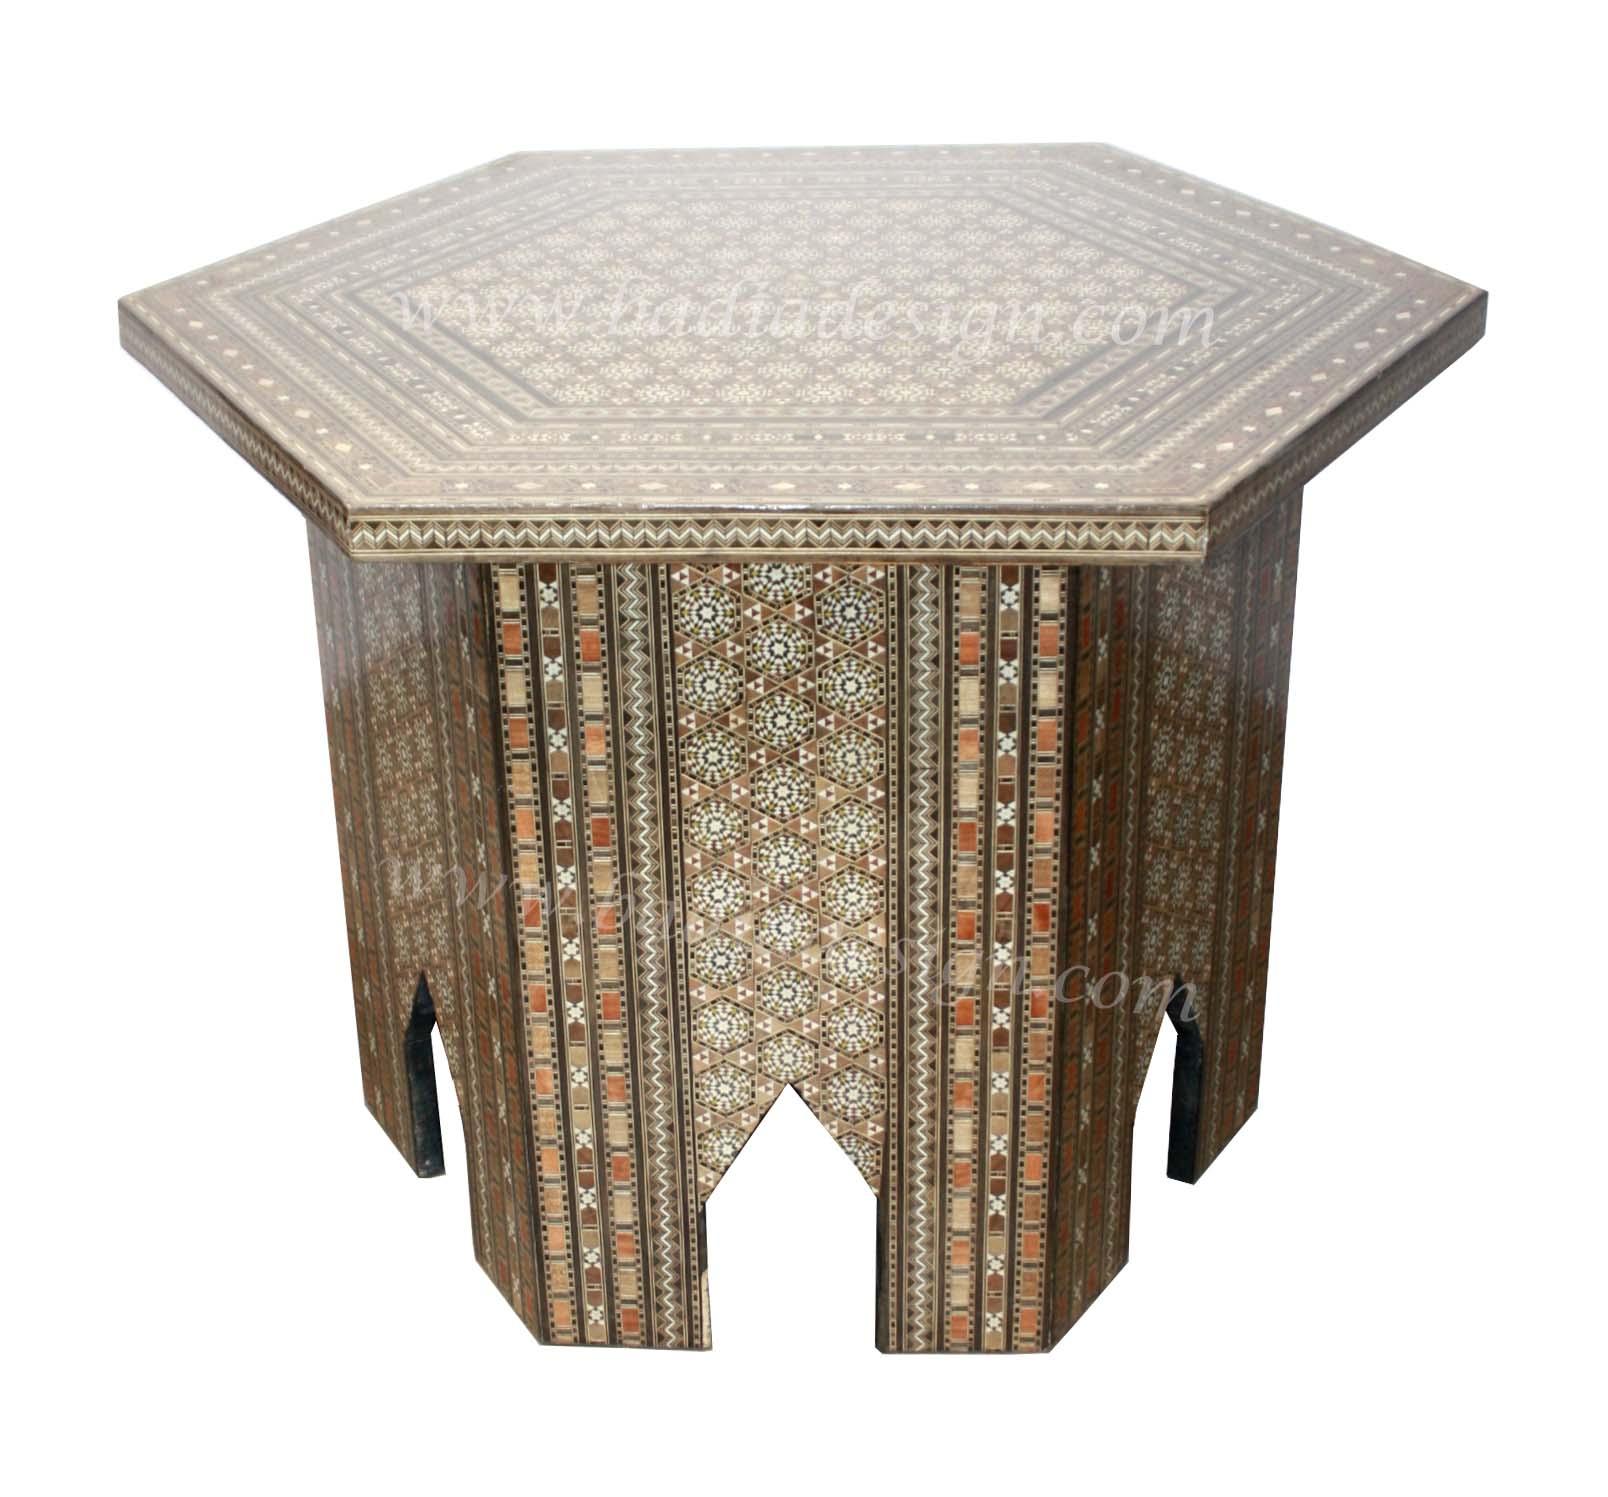 syrian-design-side-table-mop-st053-1.jpg